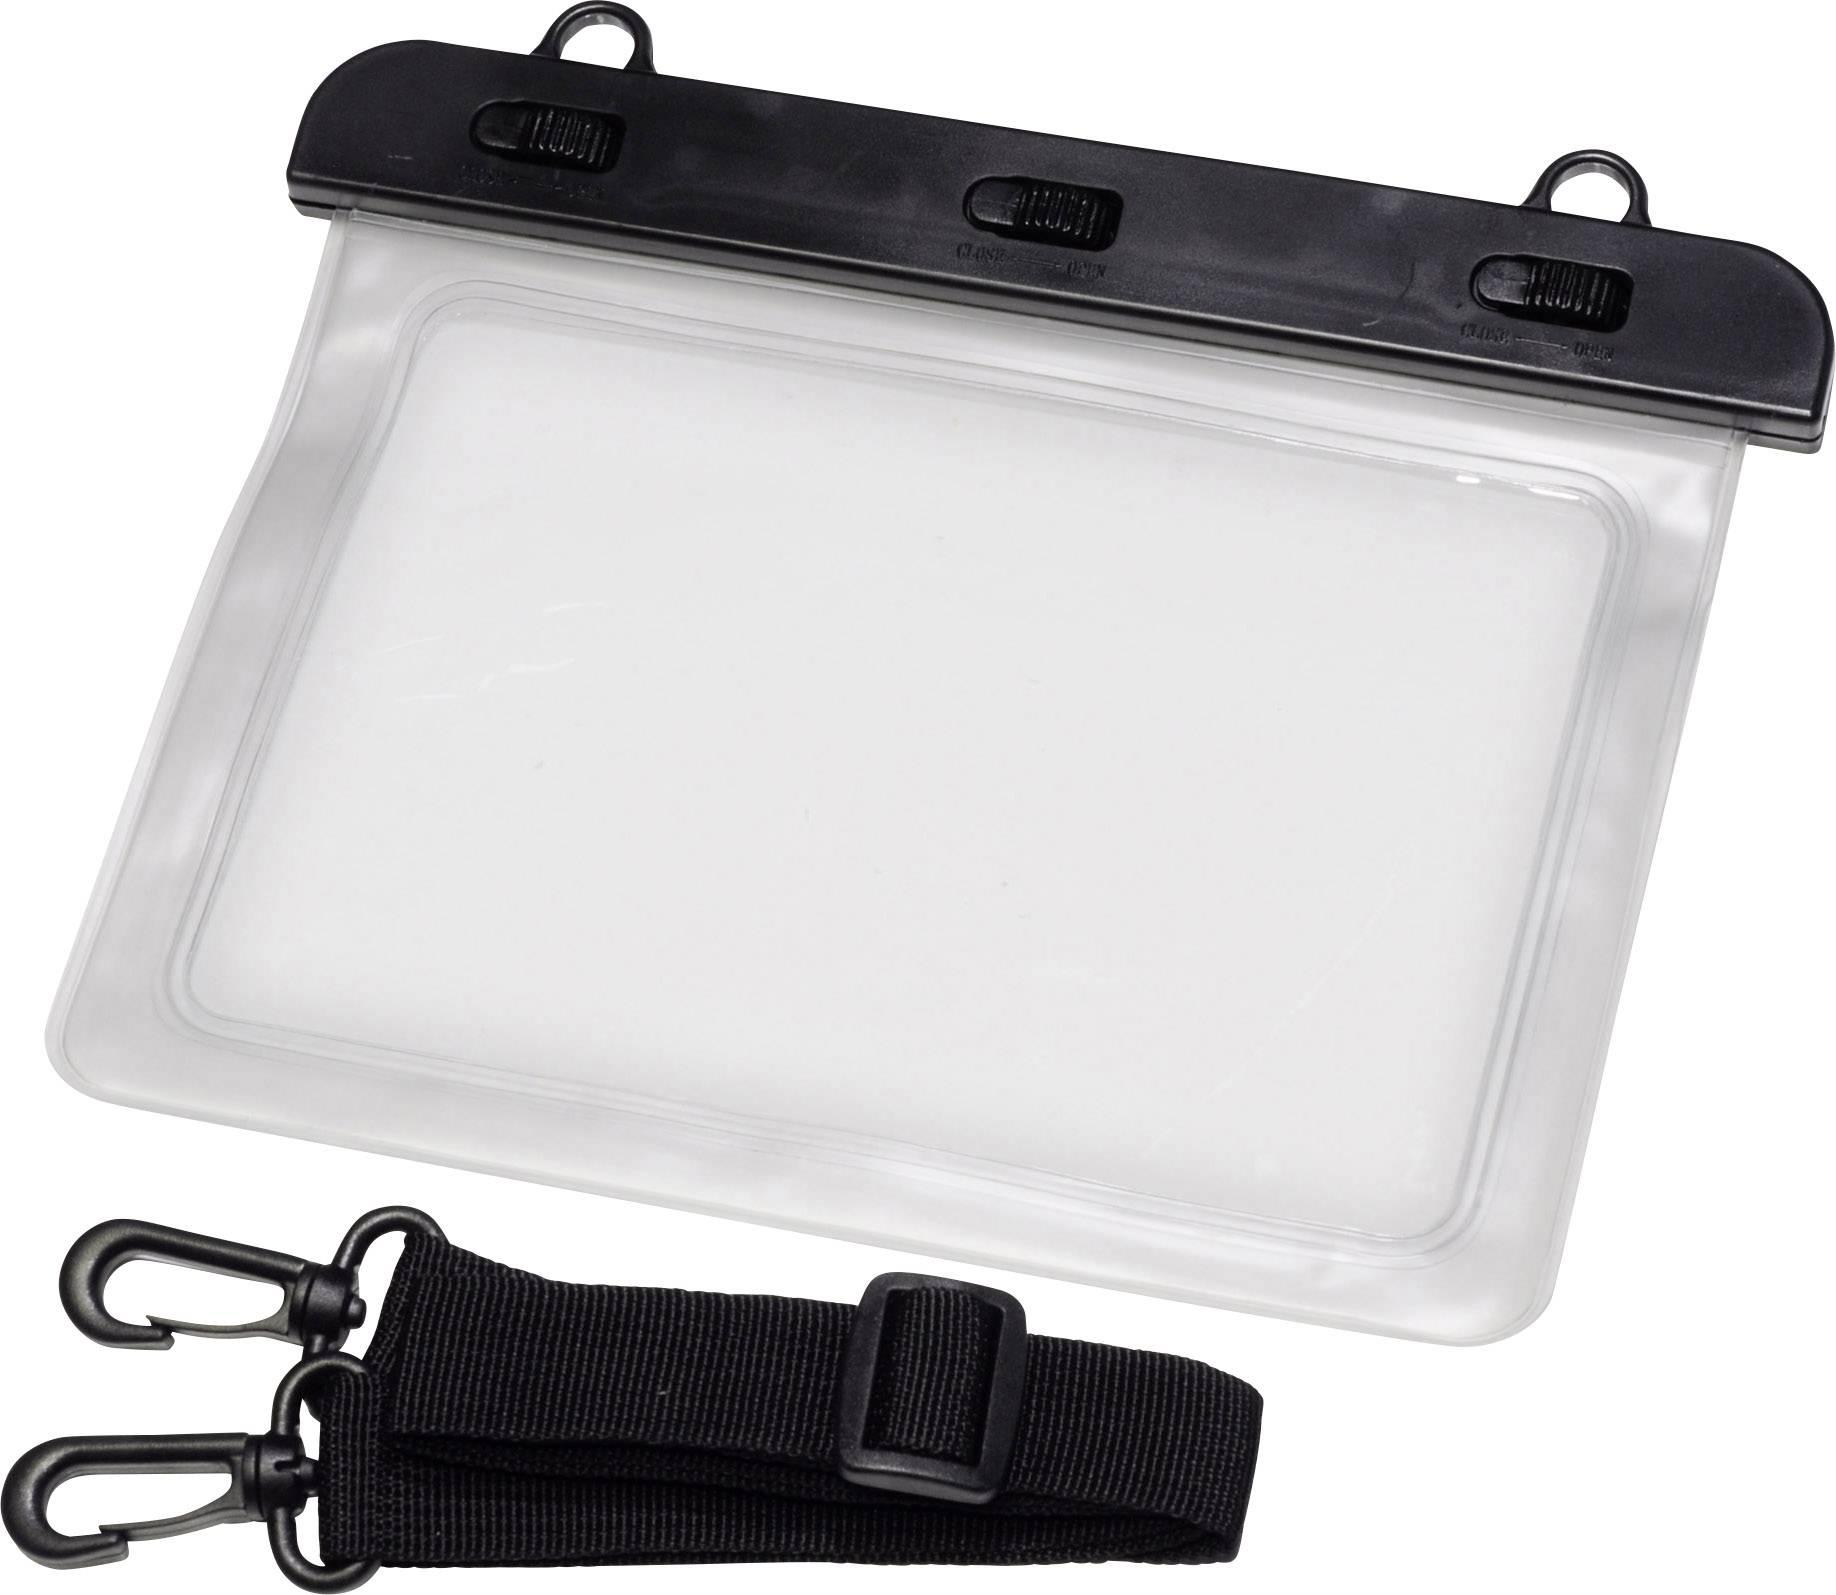 vodoodporna vrečka (Š x V) 220 mm x 160 mm črna, transparentna